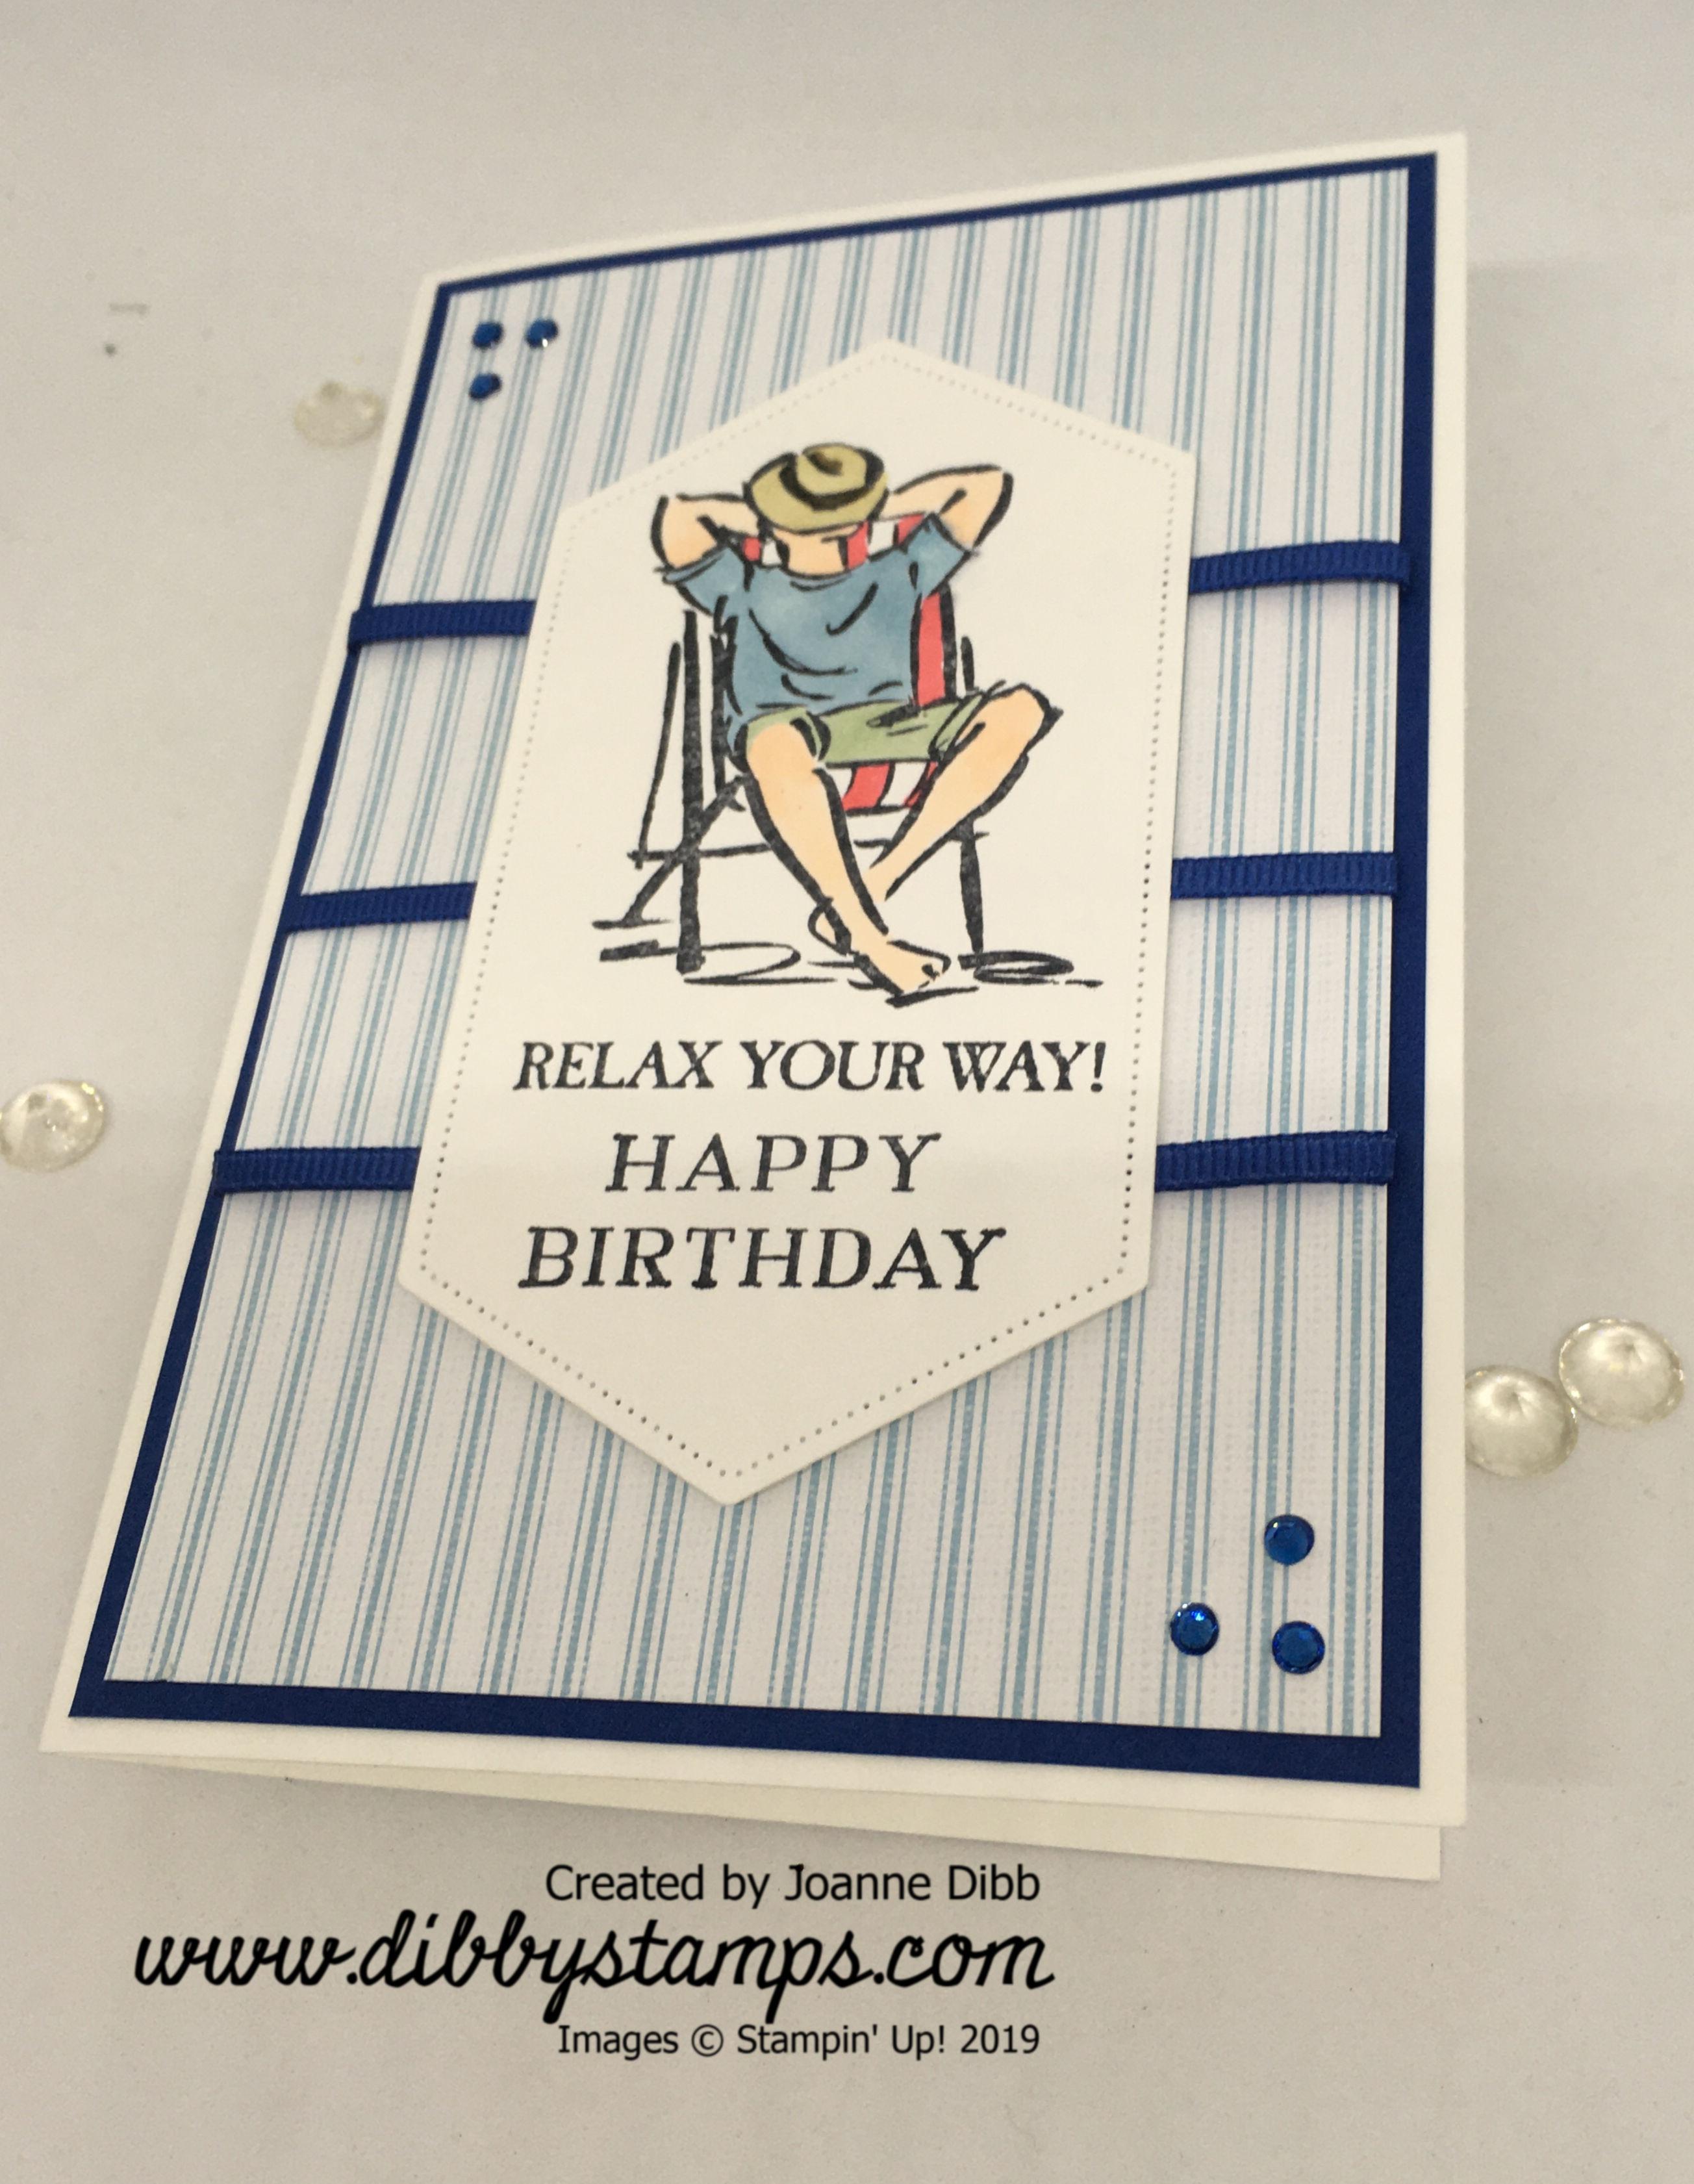 Happy Birthday Dad - flat